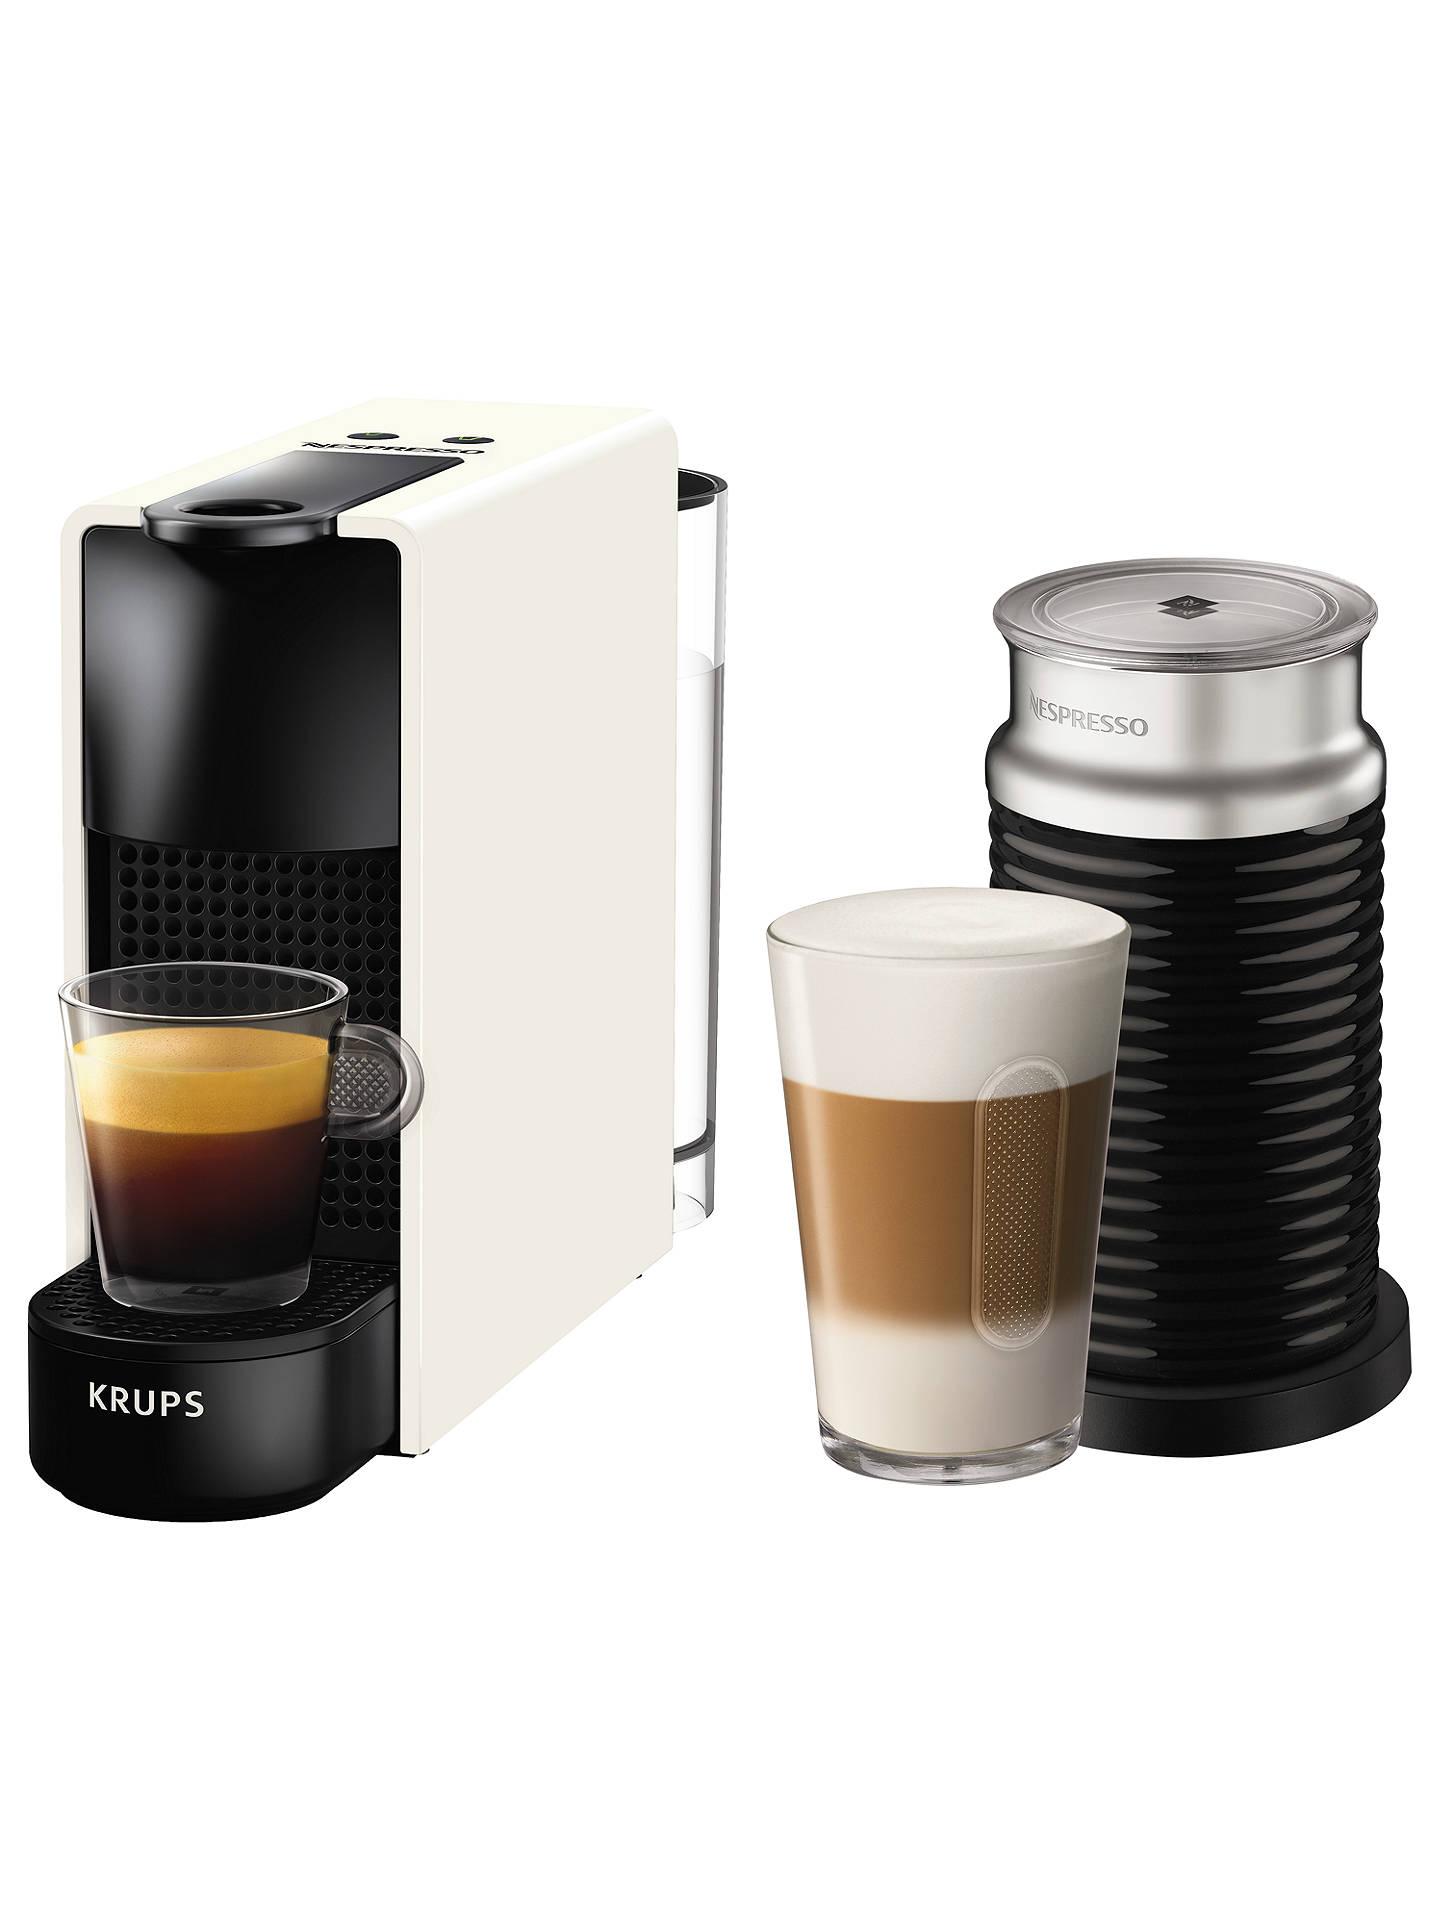 Nespresso Essenza Mini Intense Coffee Machine By Krups With Aeroccino Milk Frother, White/Black by Nespresso